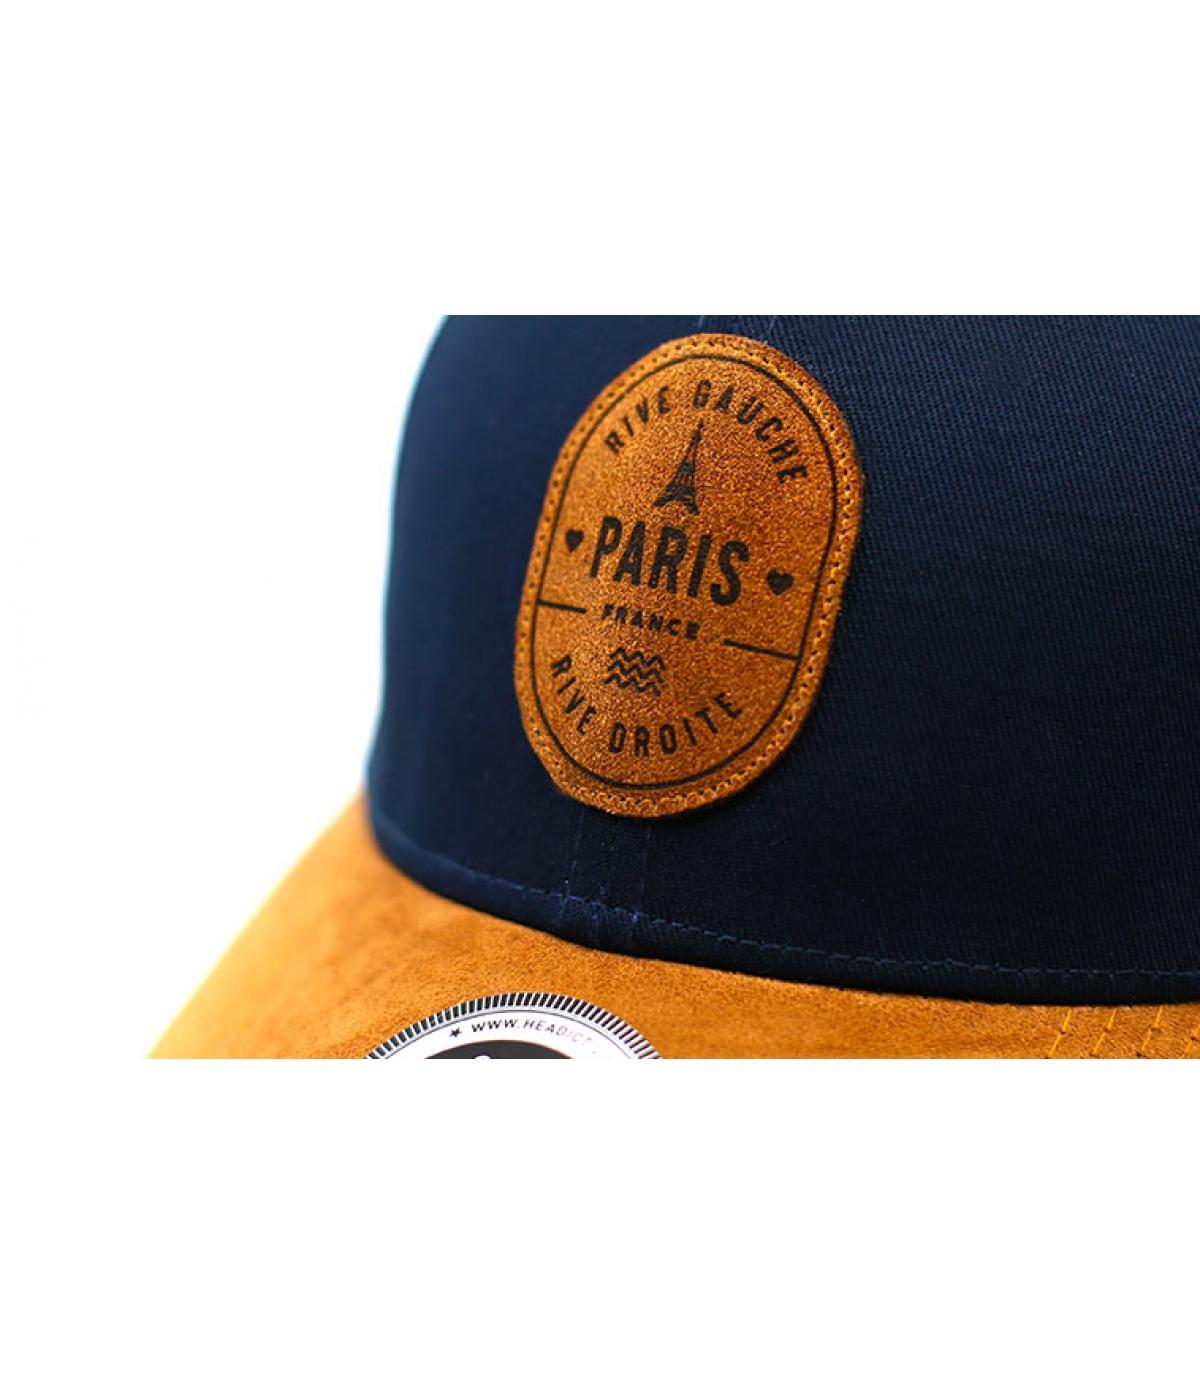 Details Curve Paris - Abbildung 3